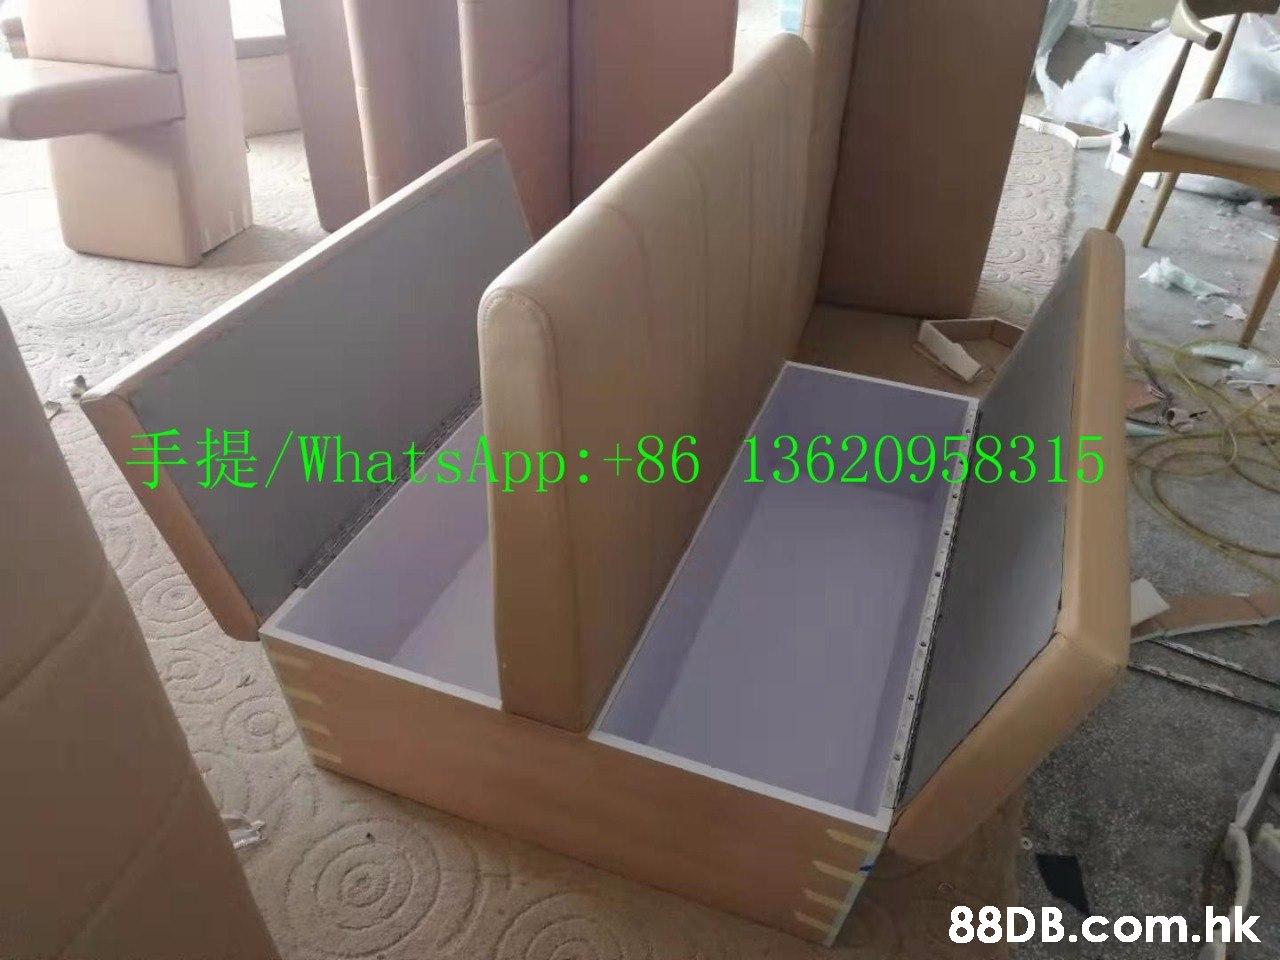 F/WhatsApp : +86 13620958315 .hk  Wood,Plywood,Cardboard,Furniture,Room